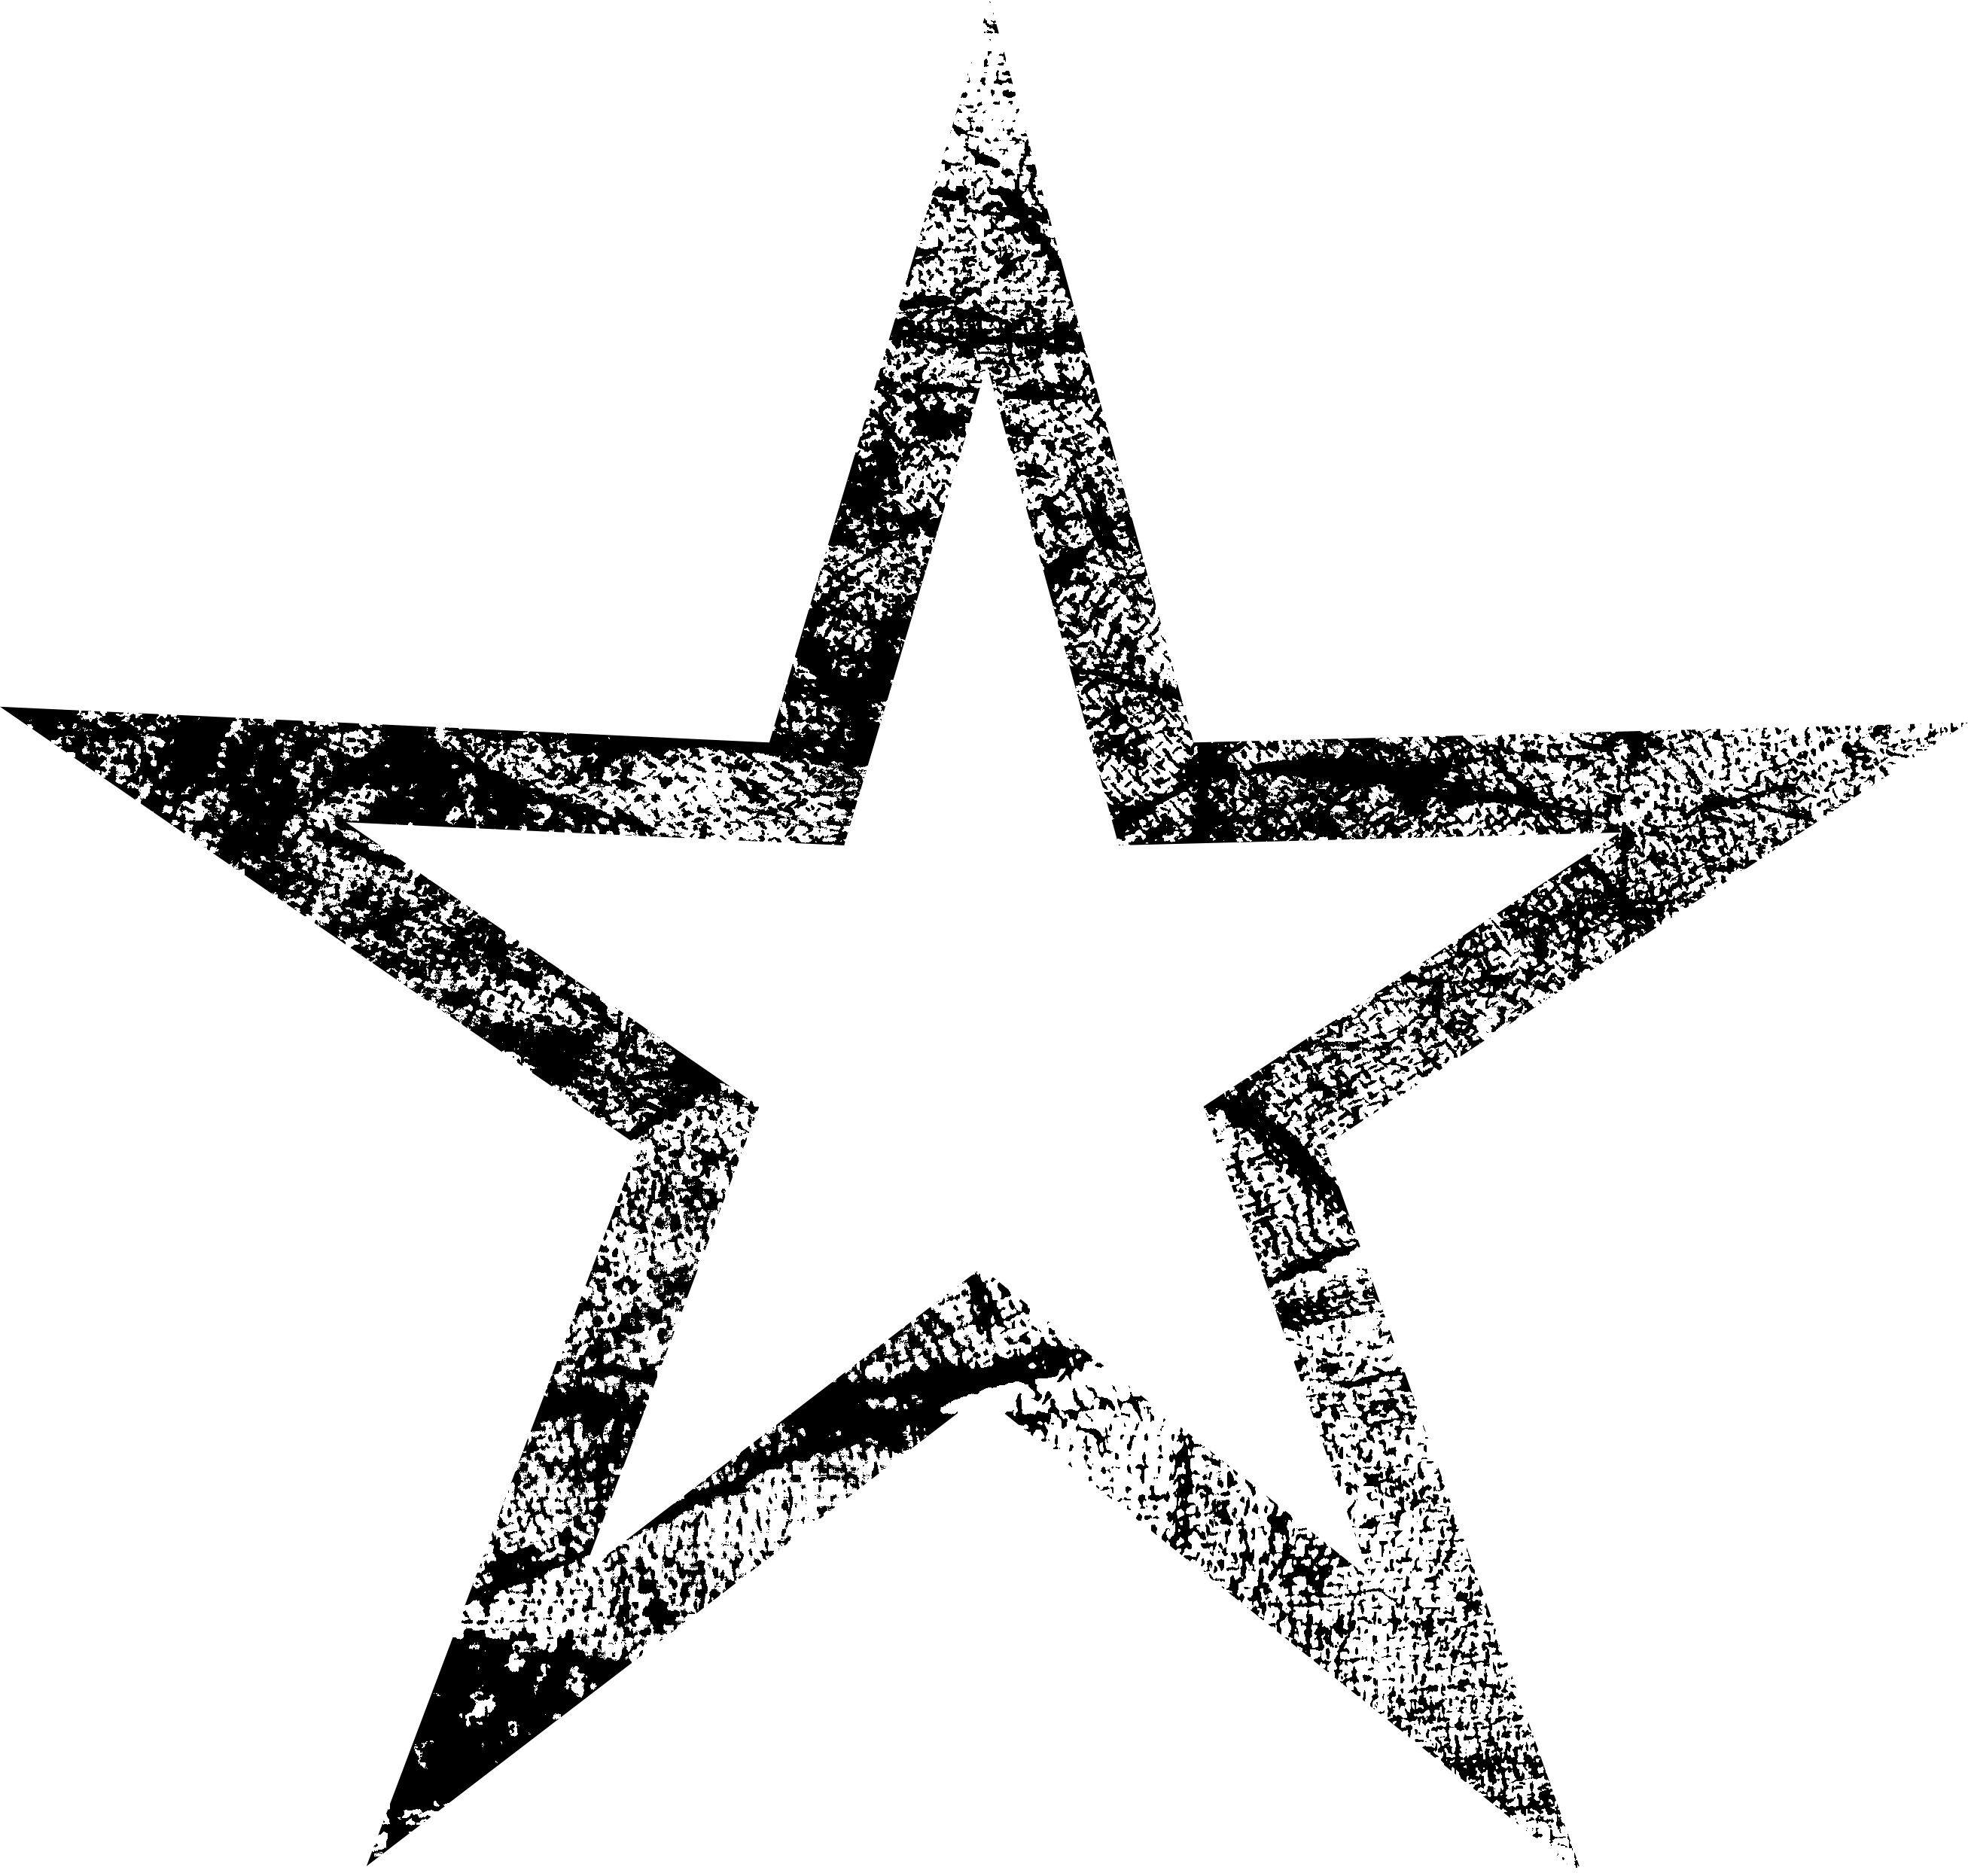 10 Grunge Stars (PNG Transparent) | OnlyGFX.com